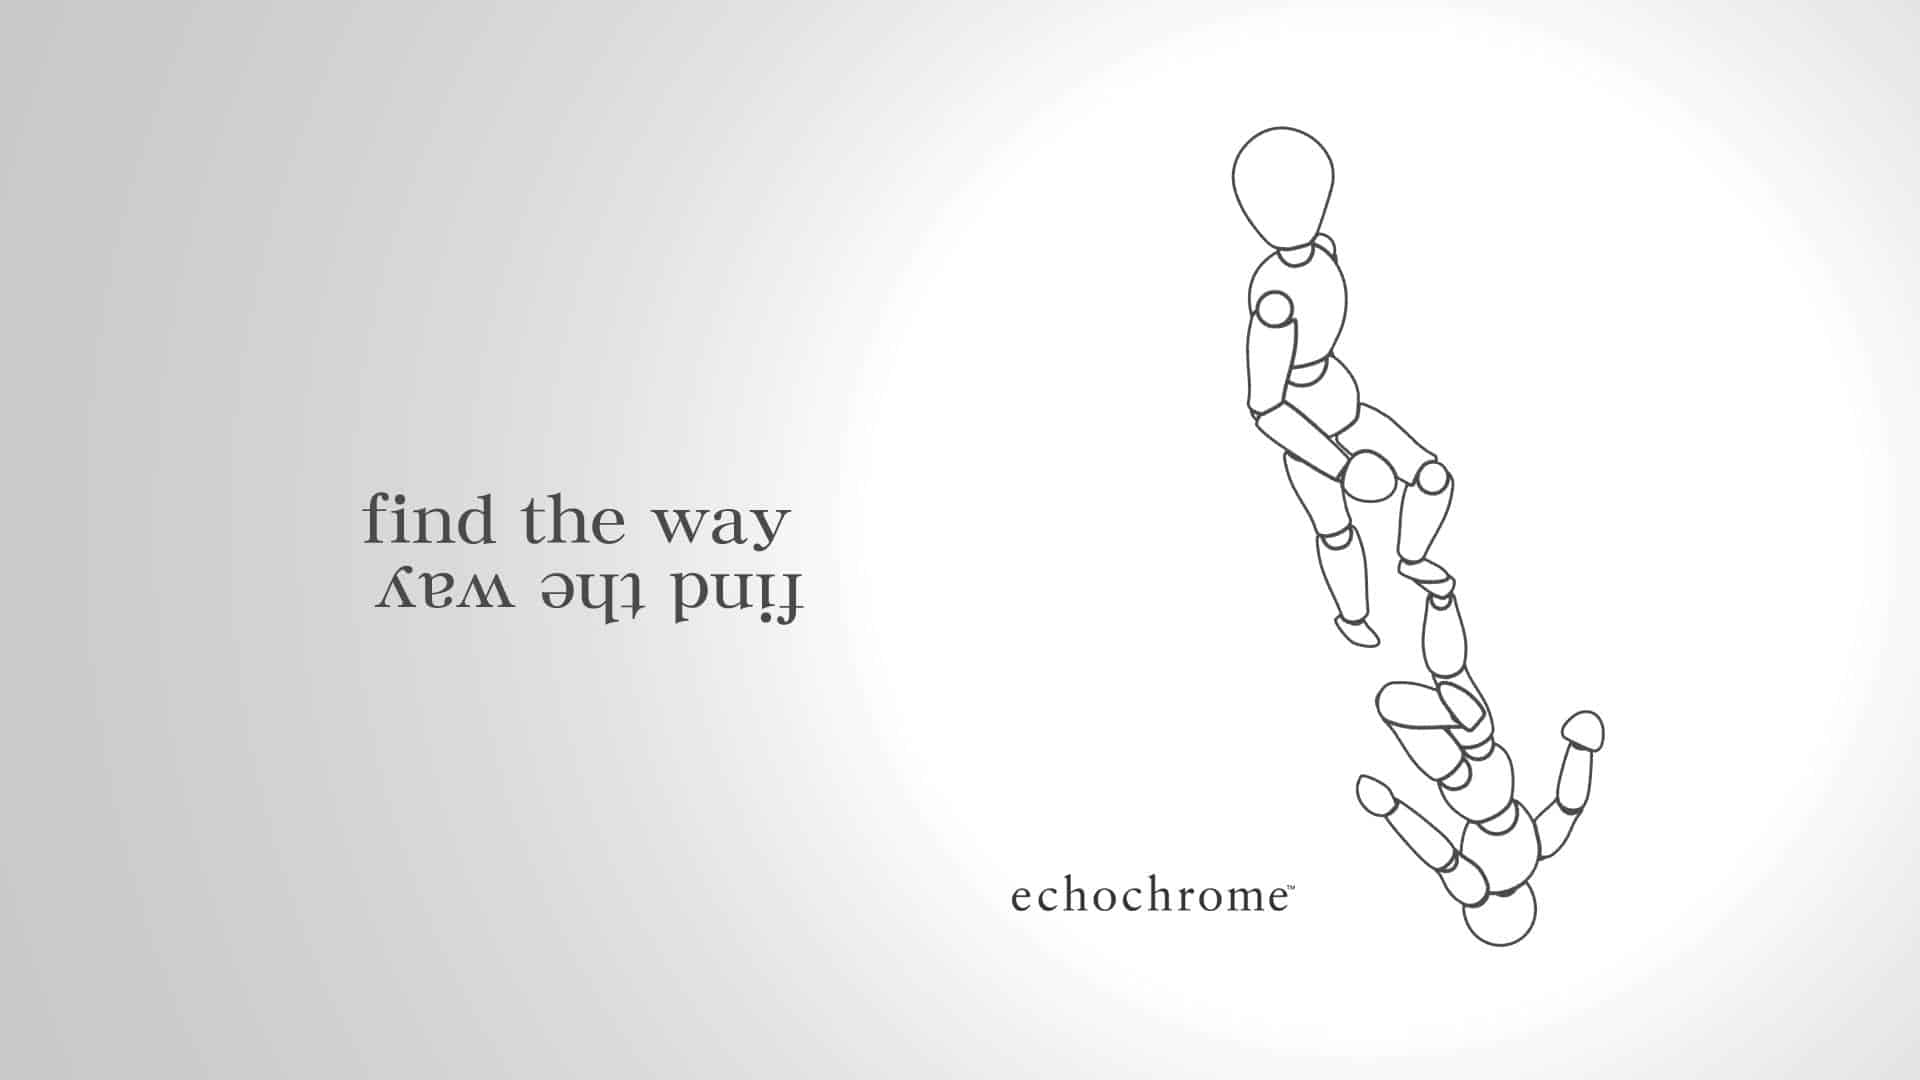 echochrome photo credit: web